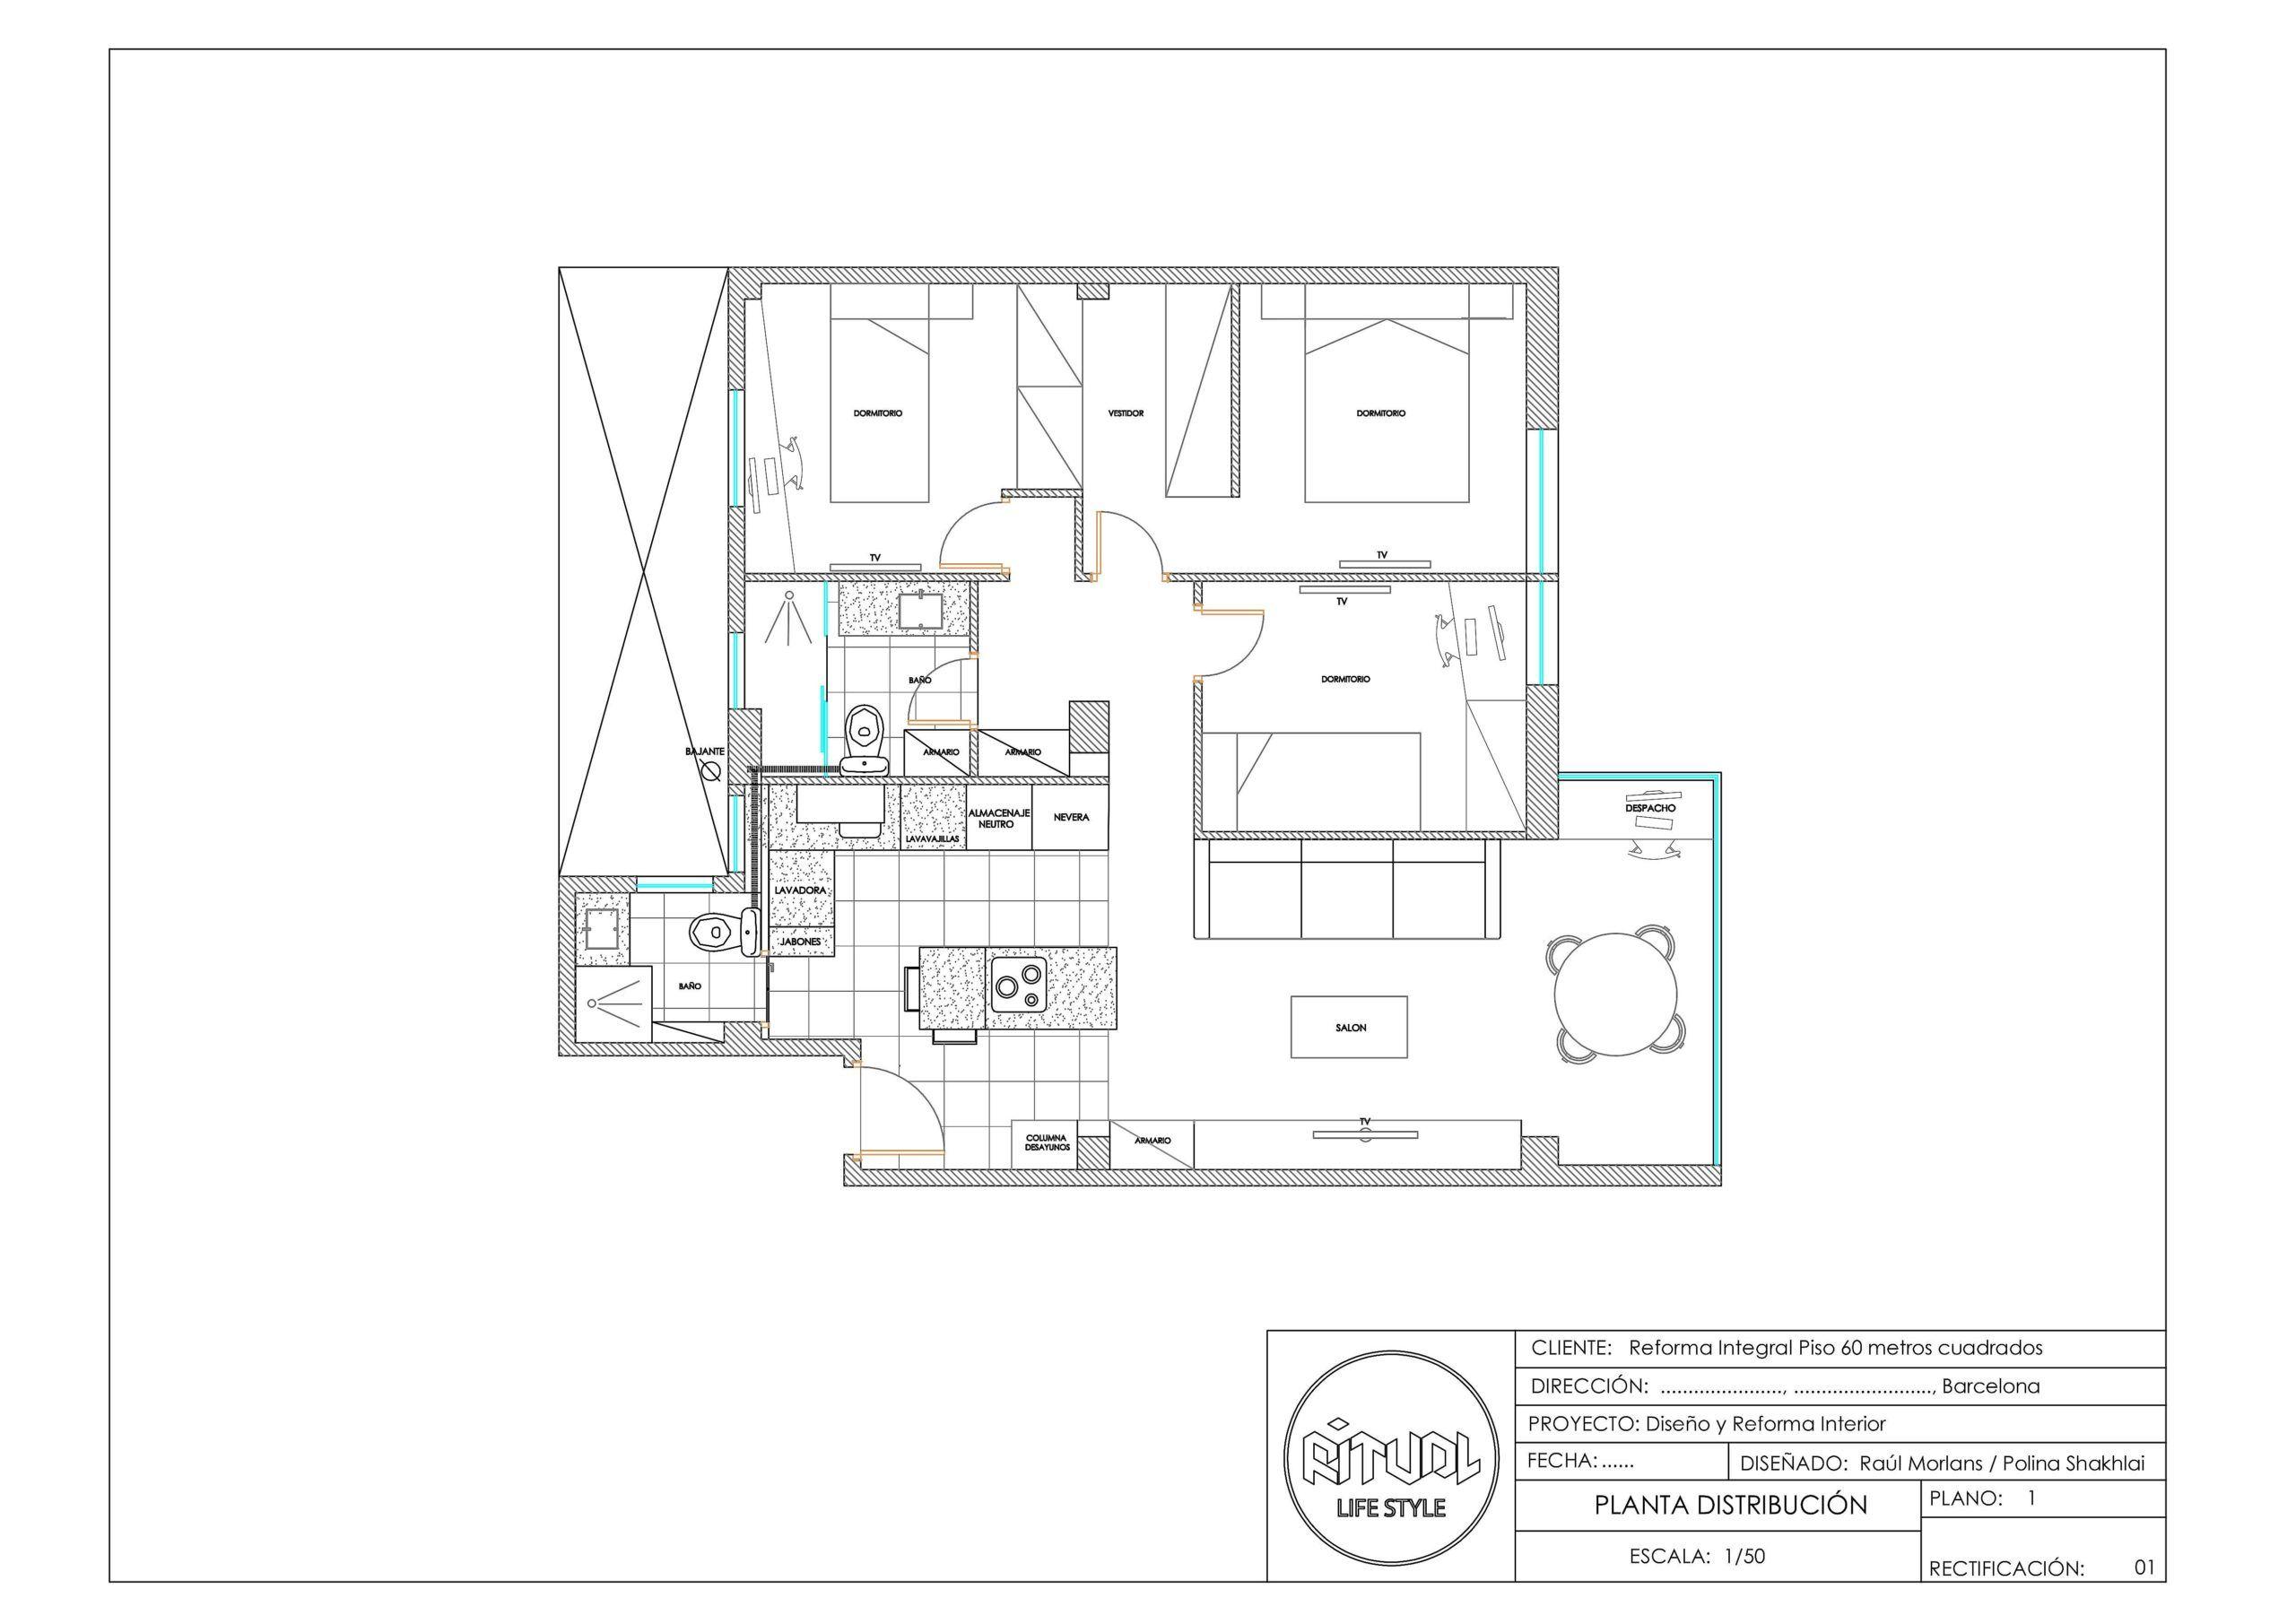 reforma integral piso 60 metros